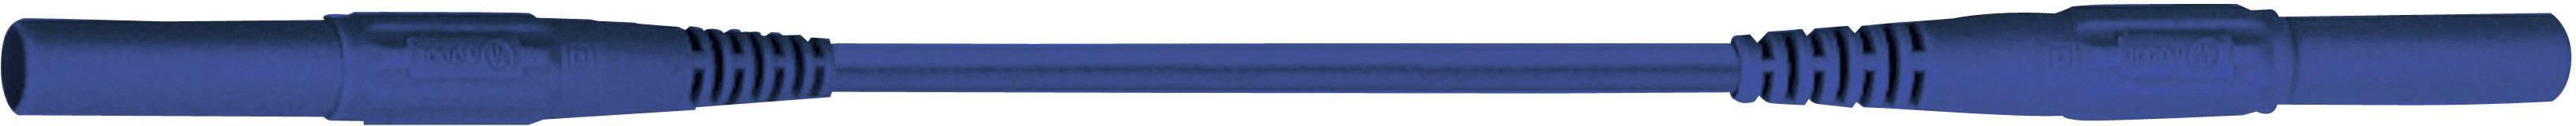 Merací kábel Multicontact XMF-419, 2,5 mm², 2 m, modrý